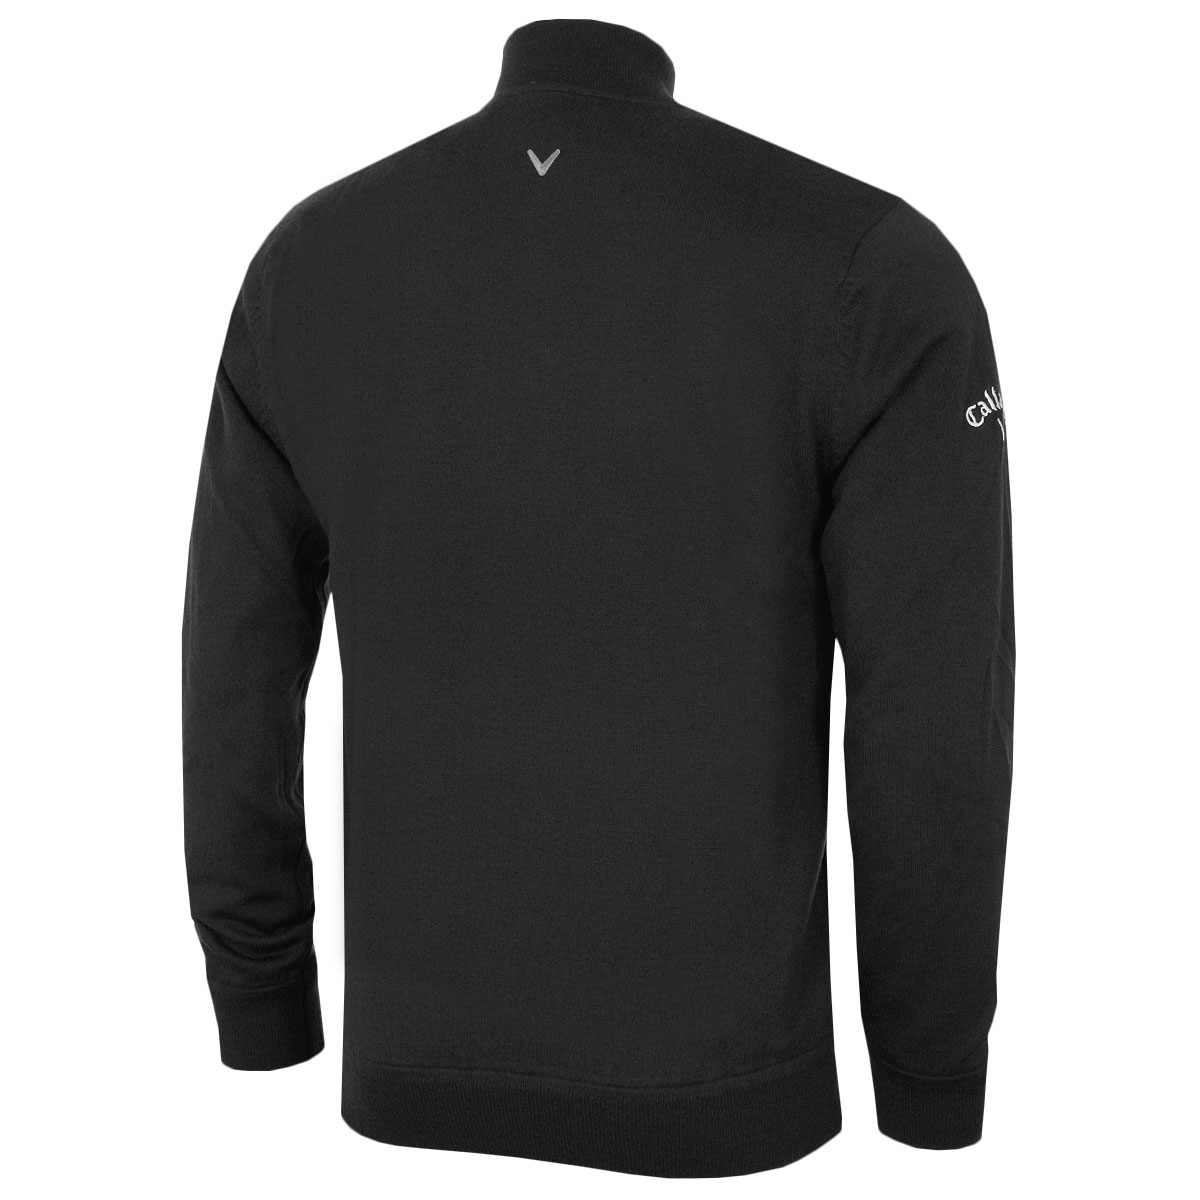 Callaway-Golf-Mens-1-4-Zip-Mock-Merino-Windproof-Sweater-Pullover-43-OFF-RRP thumbnail 4